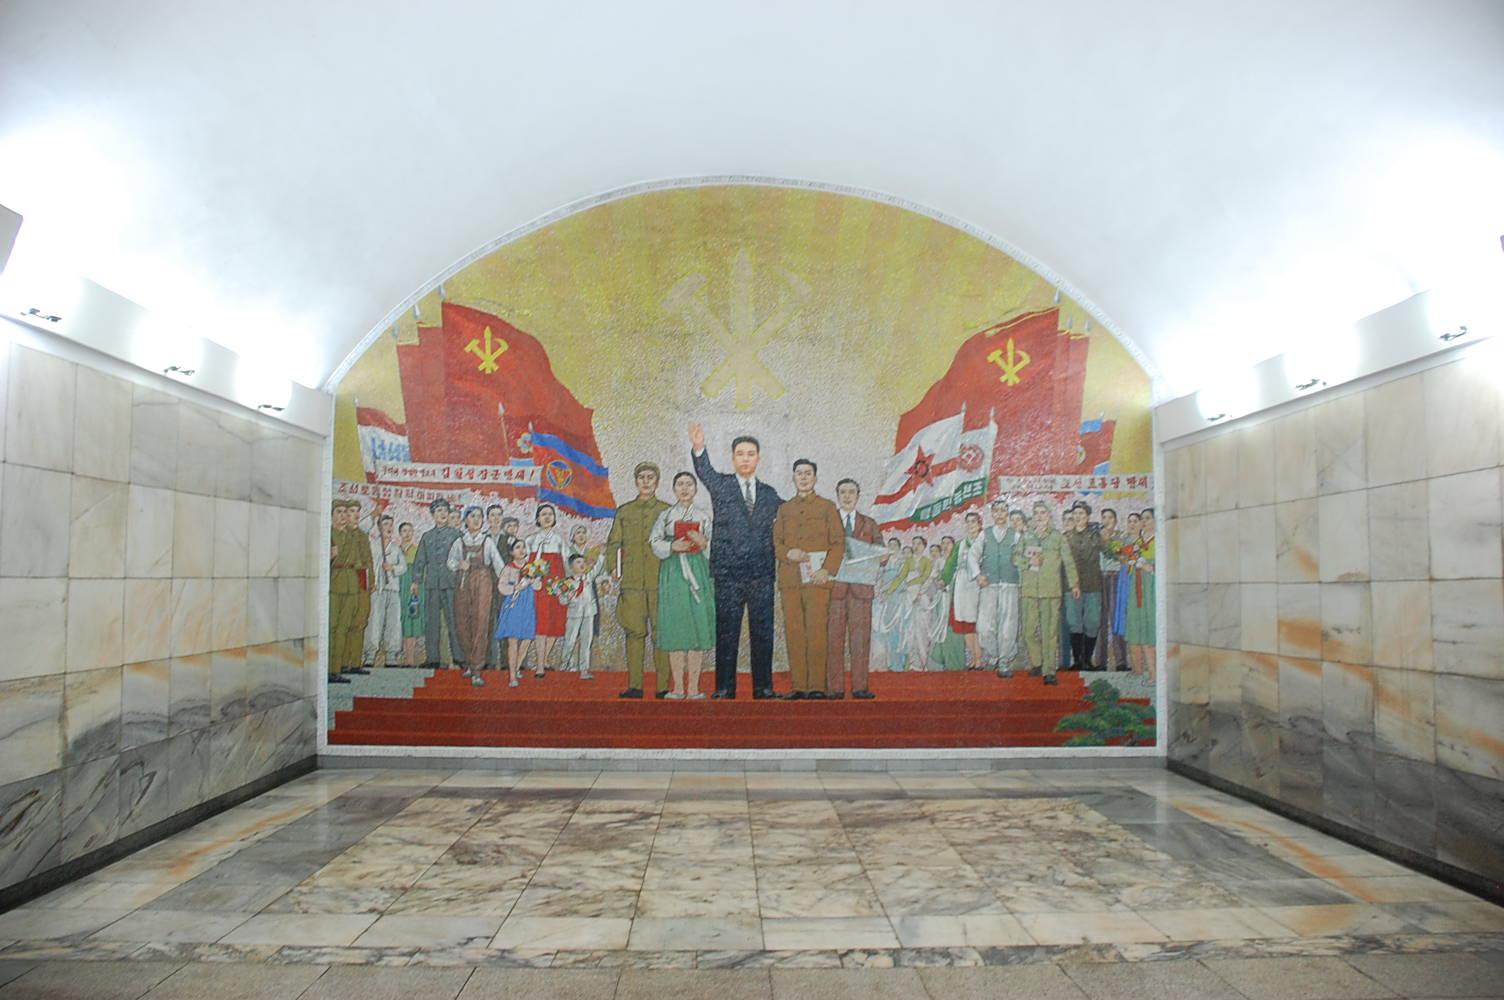 Ponghwa Station. Pyongyang Metro, North Korea